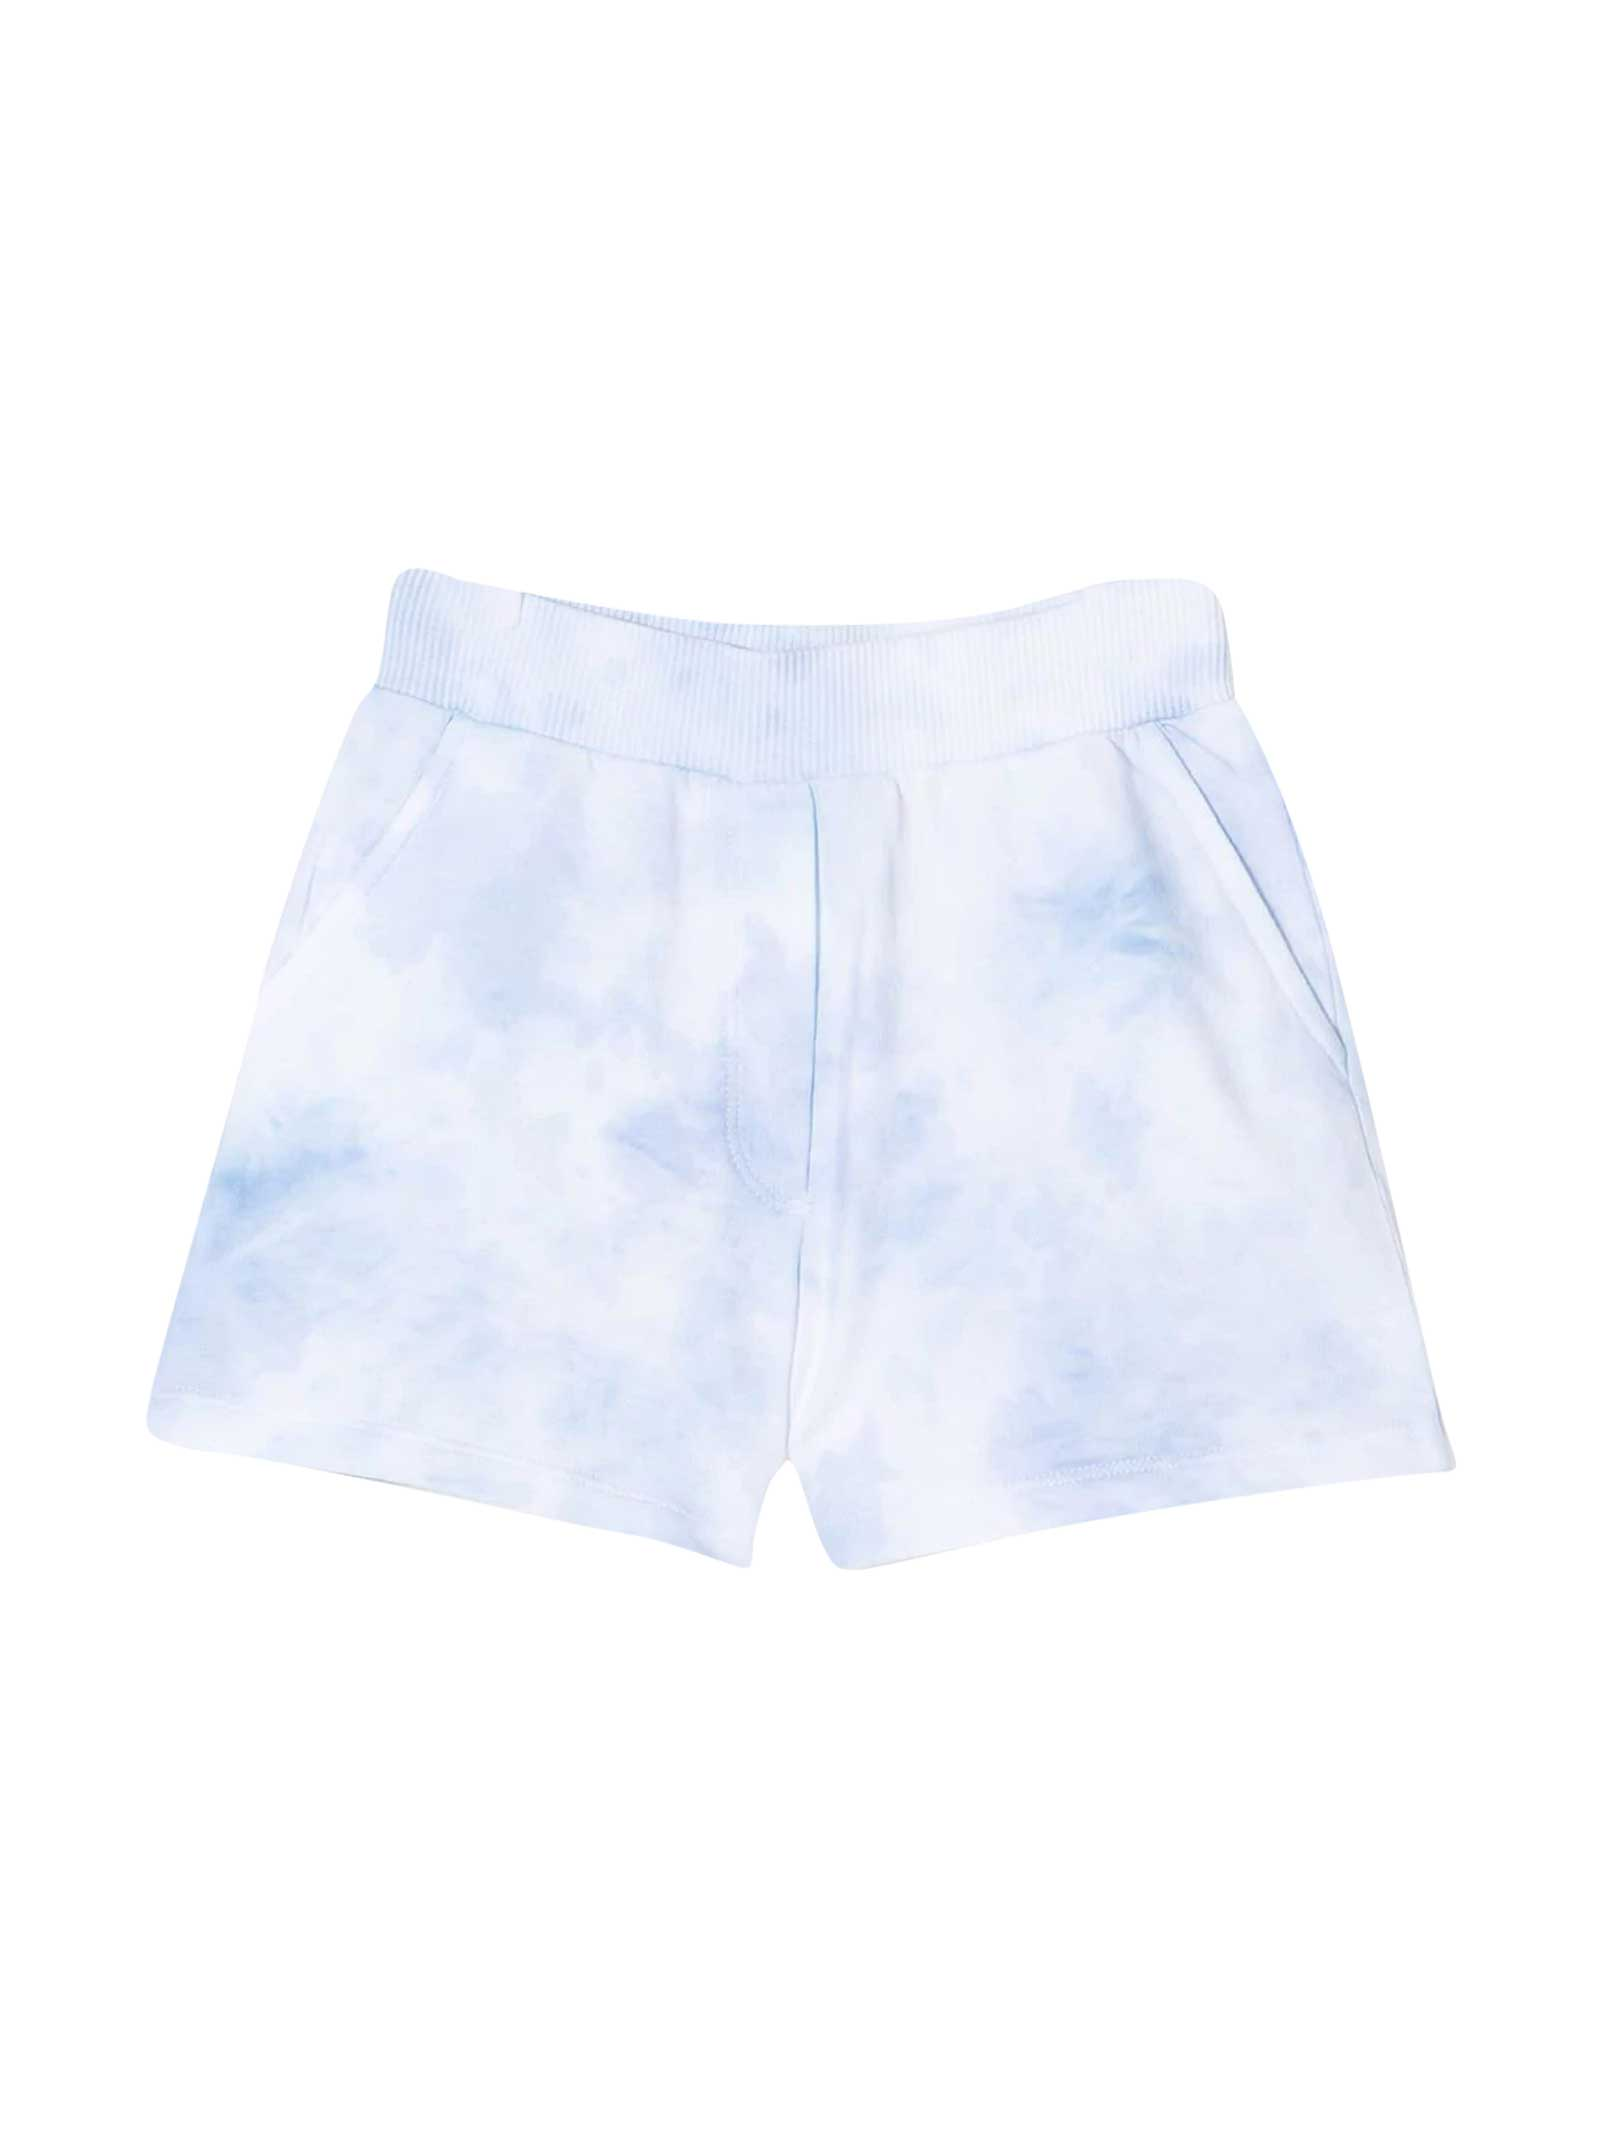 Ttie Dye Print Shorts